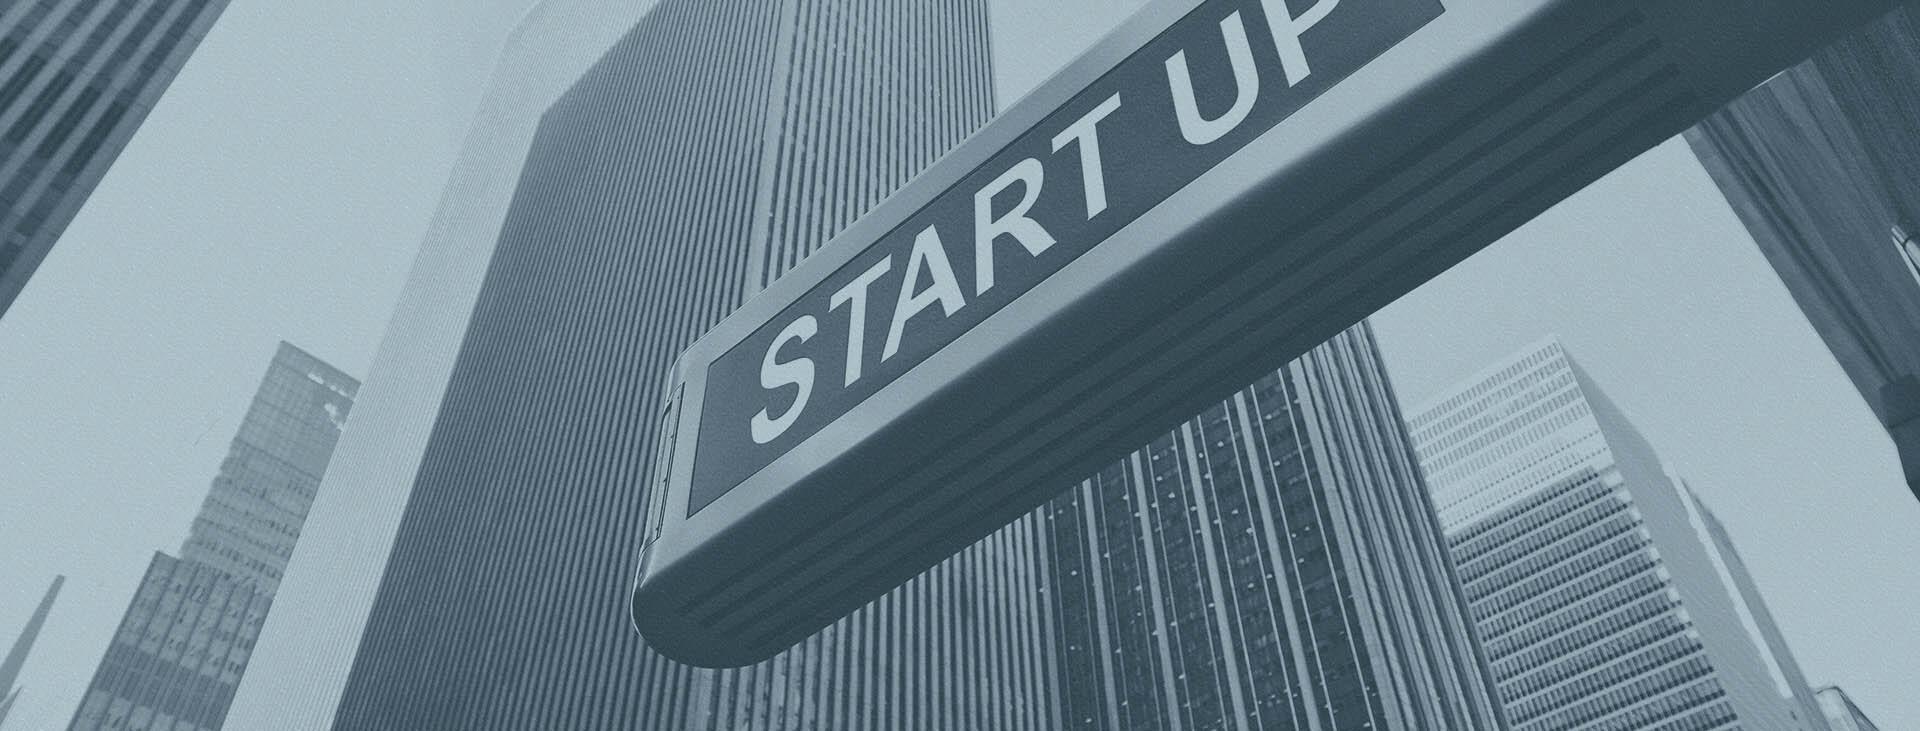 banner-startup-090817